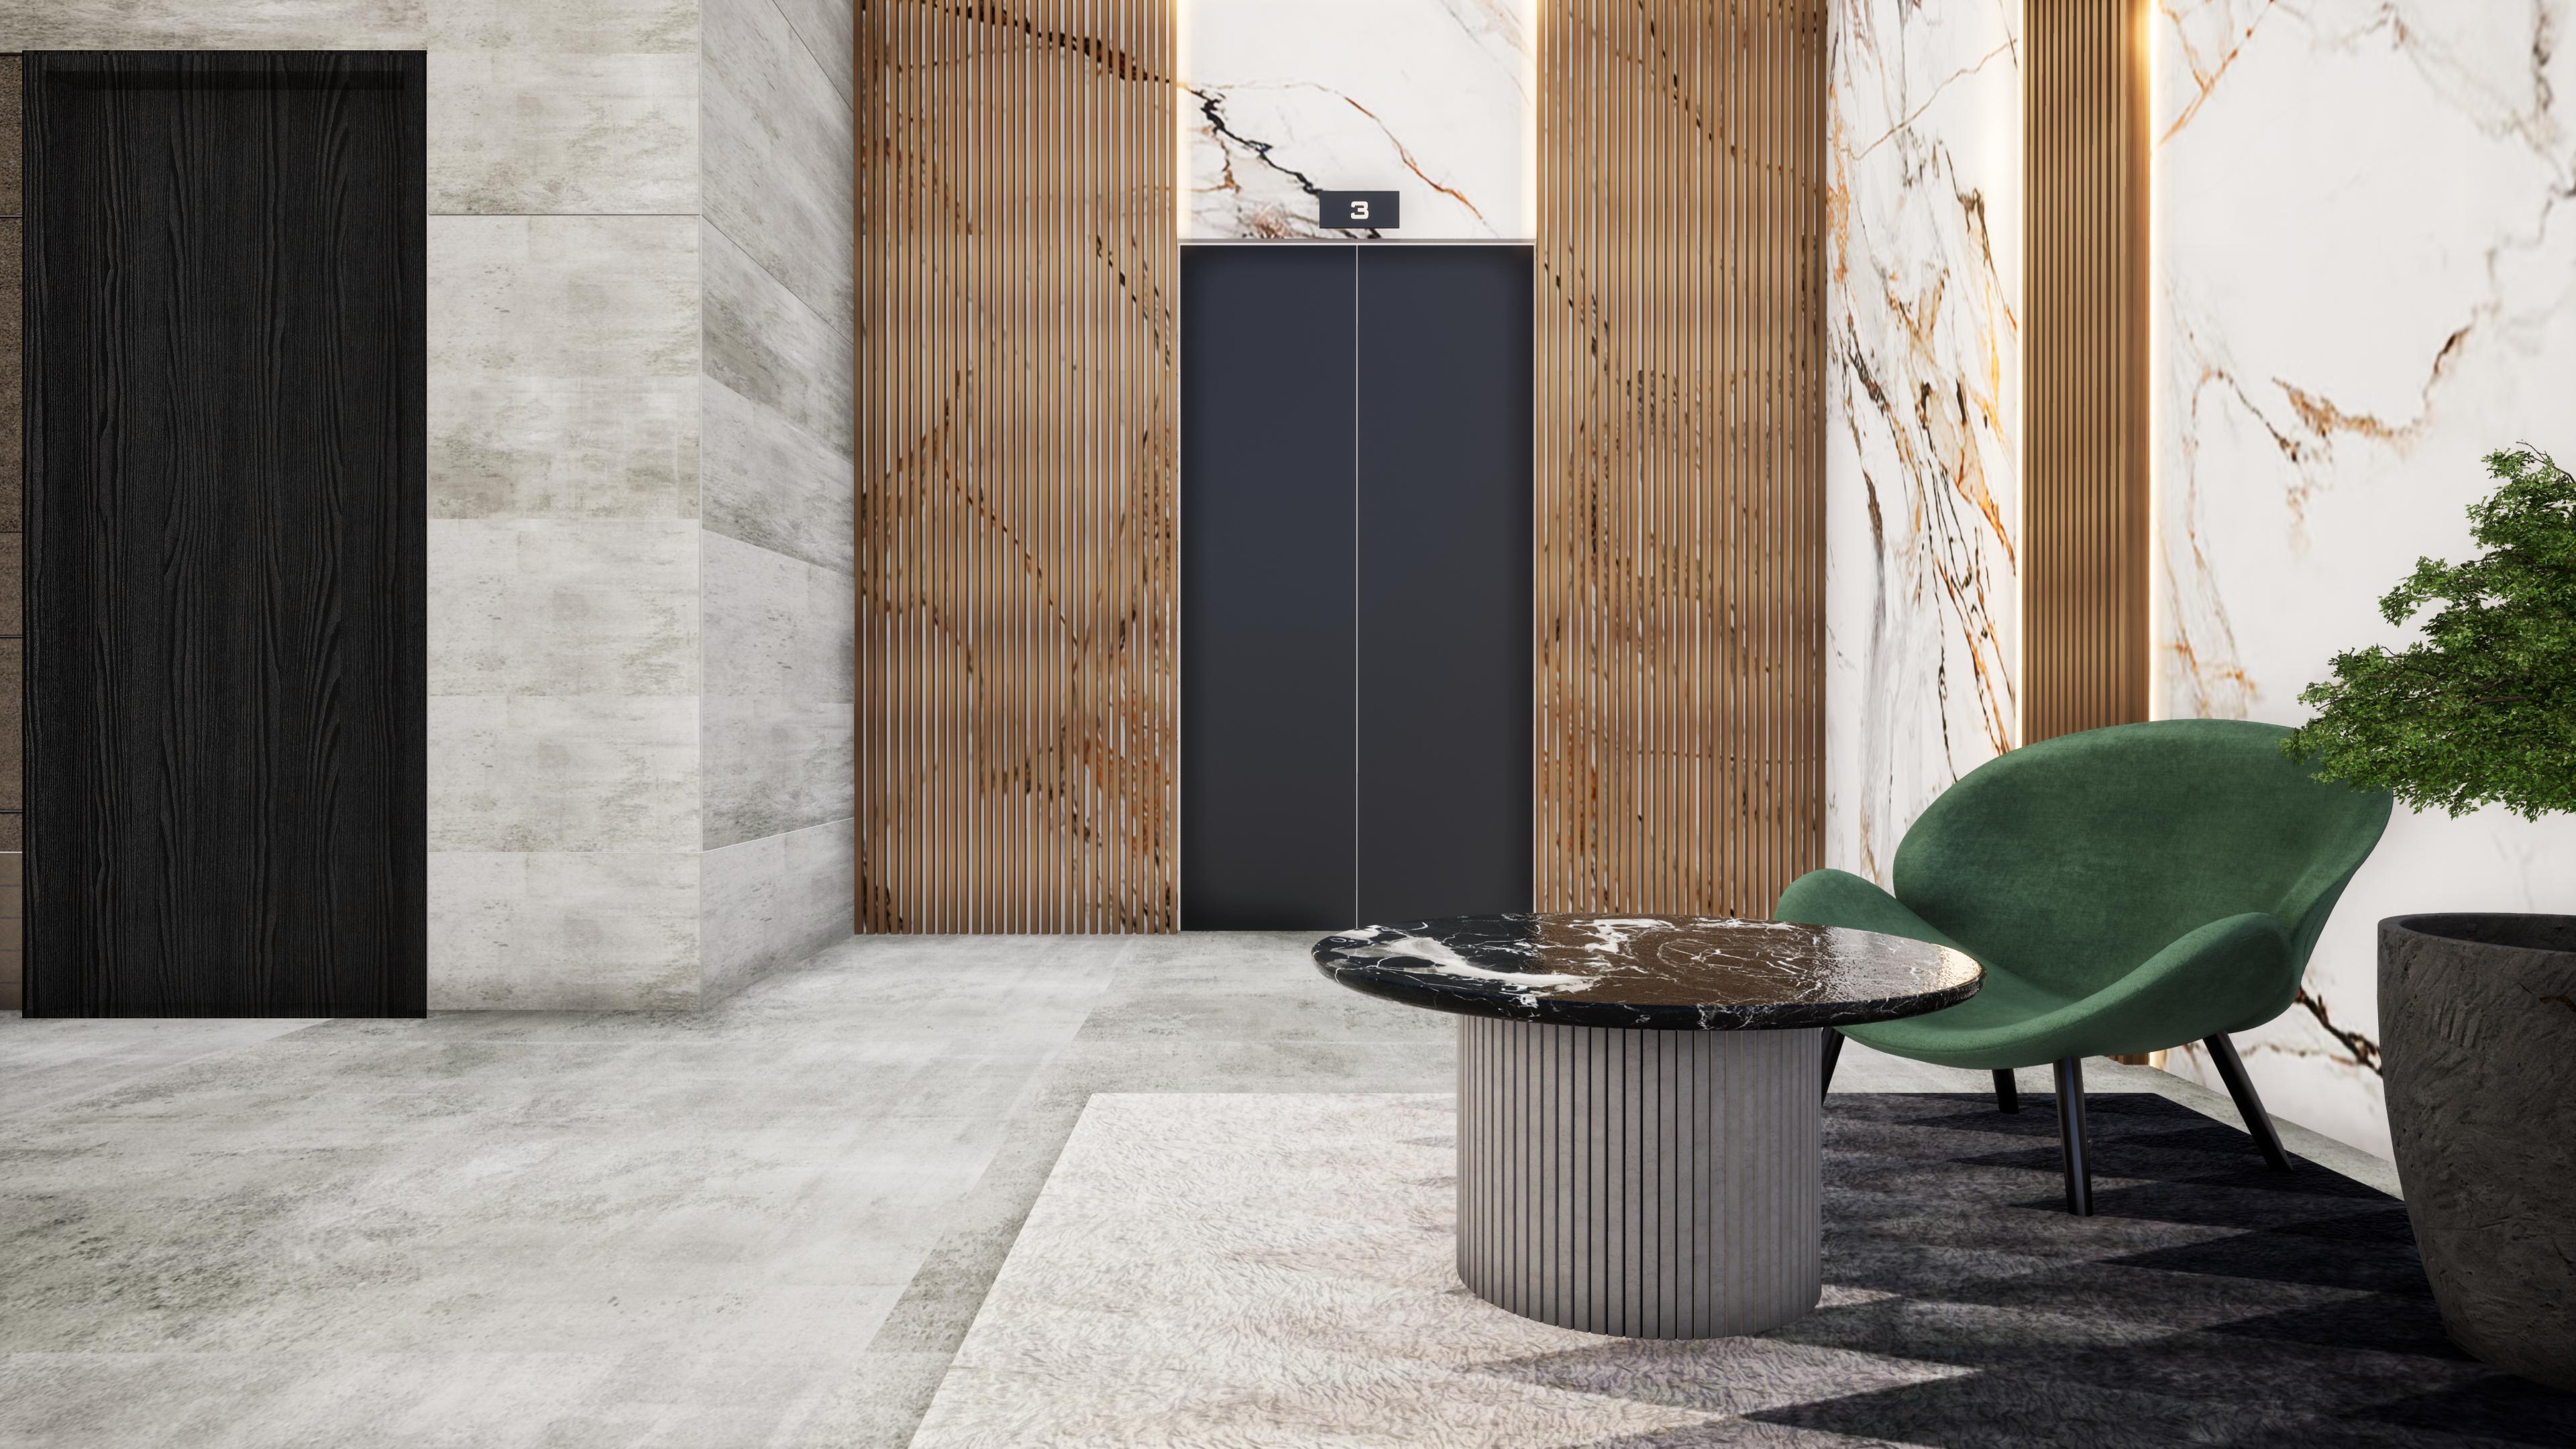 imbewu-design-greenside-concept-4